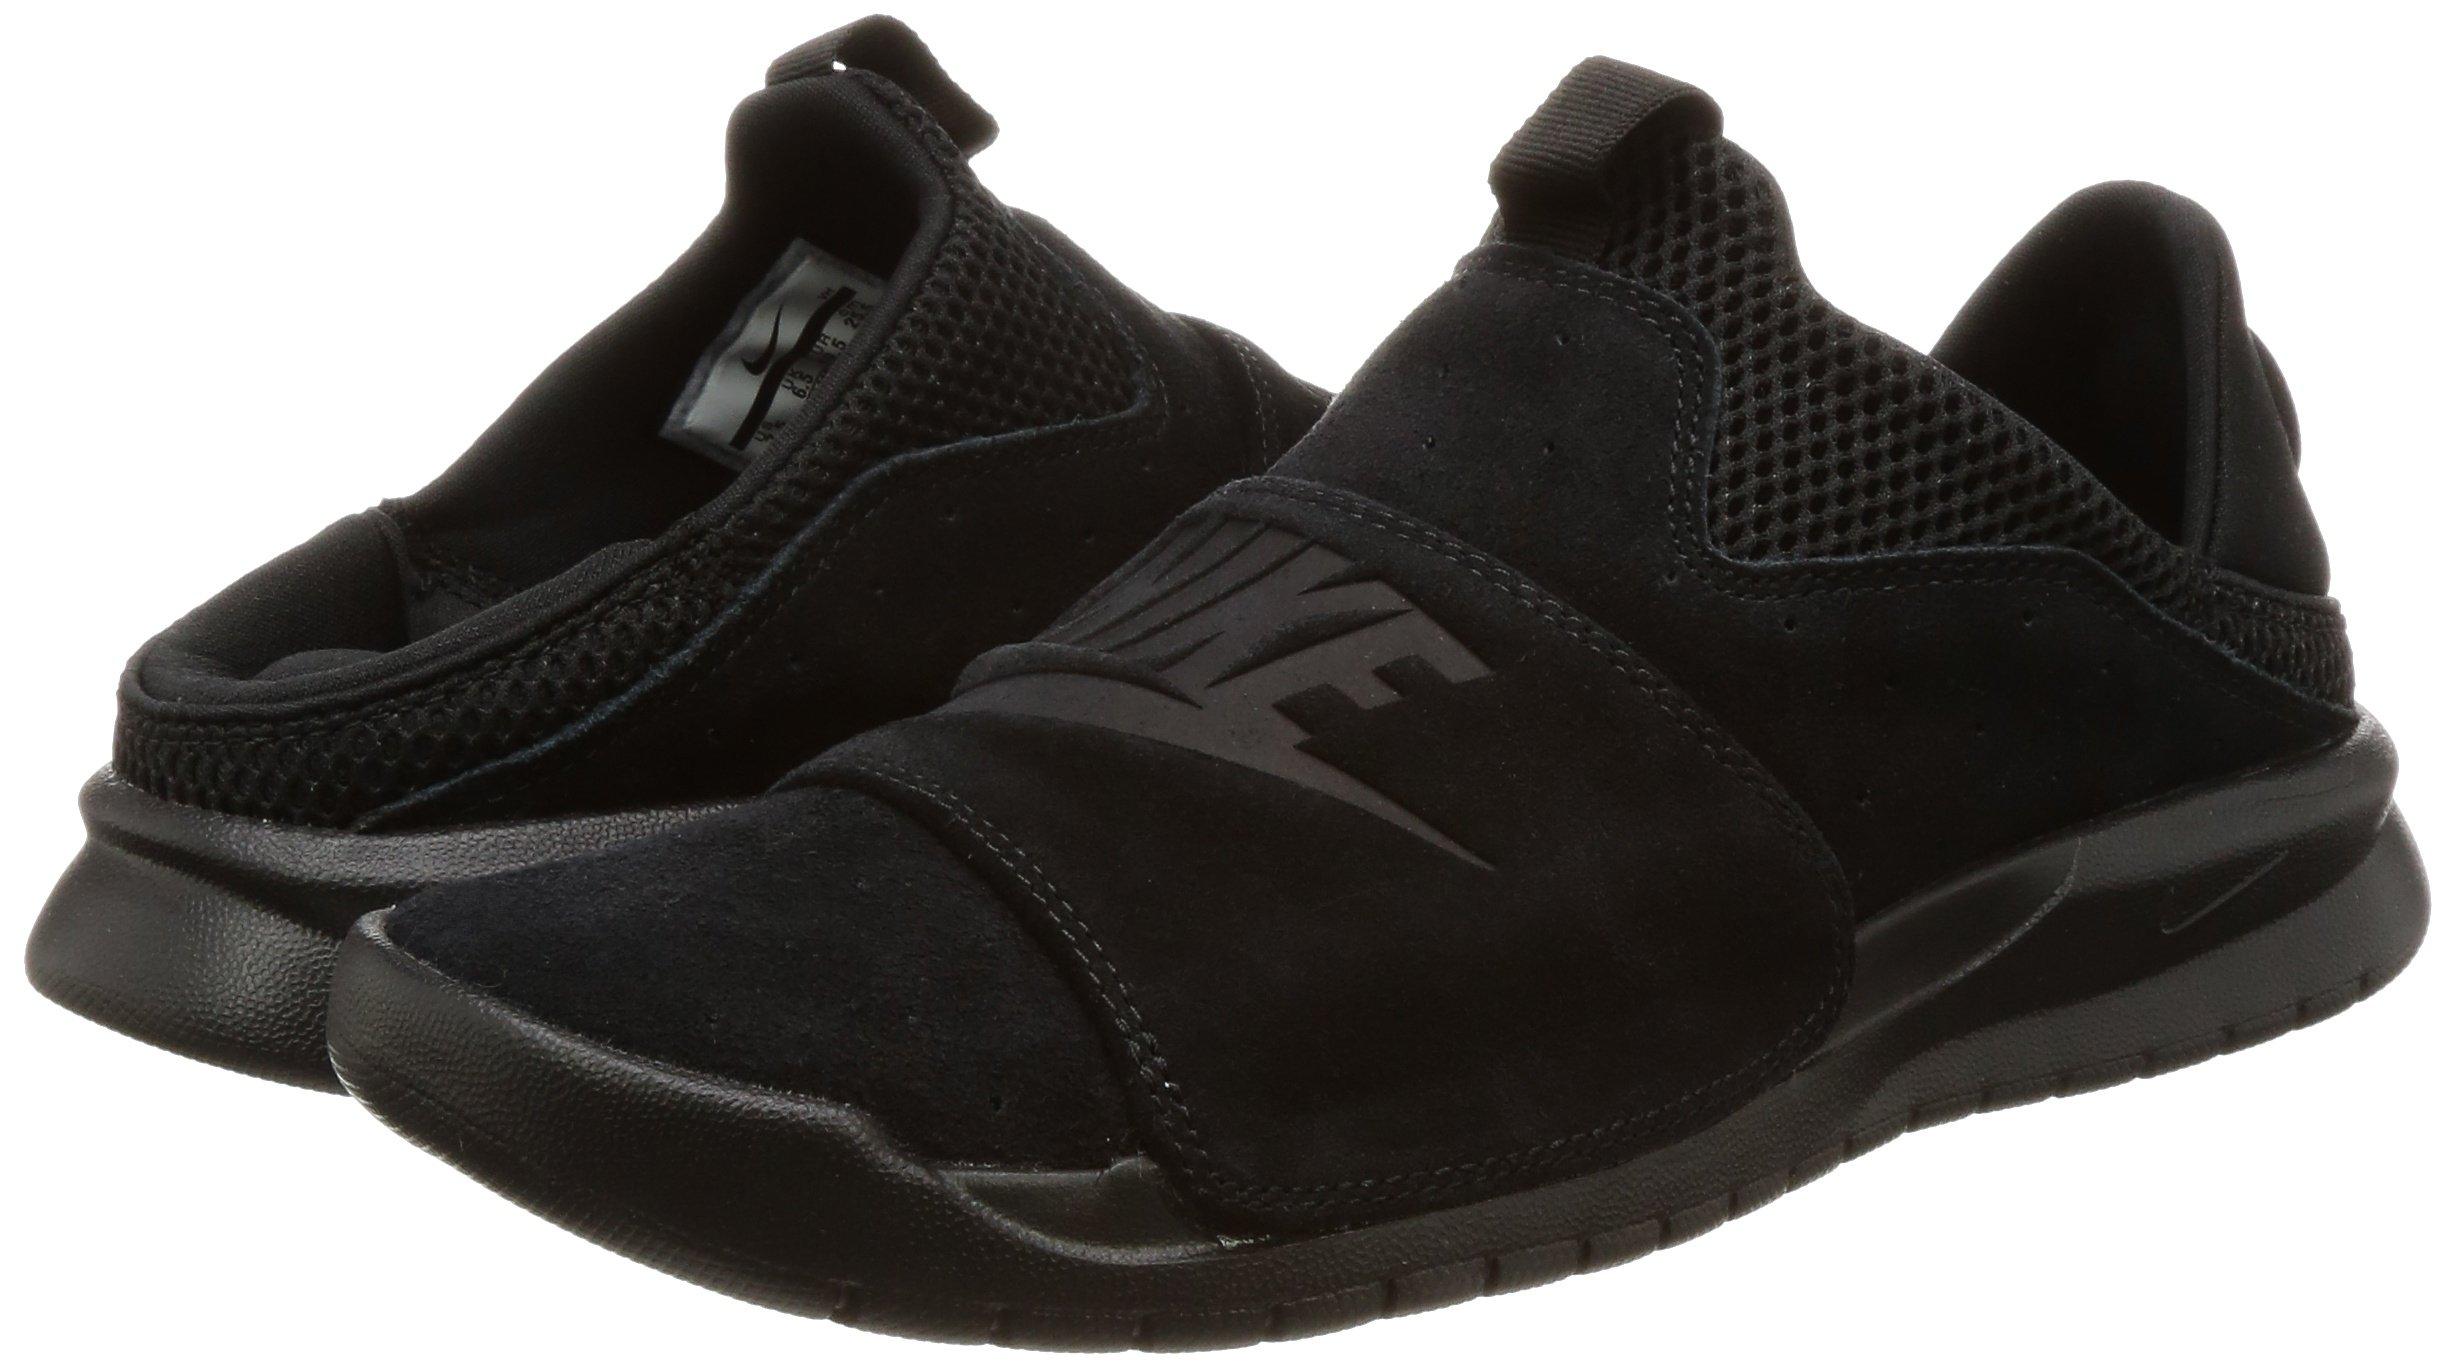 Nike BENASSI SLP Mens fashion-sneakers 882410-003_9.5 - BLACK/BLACK-BLACK by NIKE (Image #5)